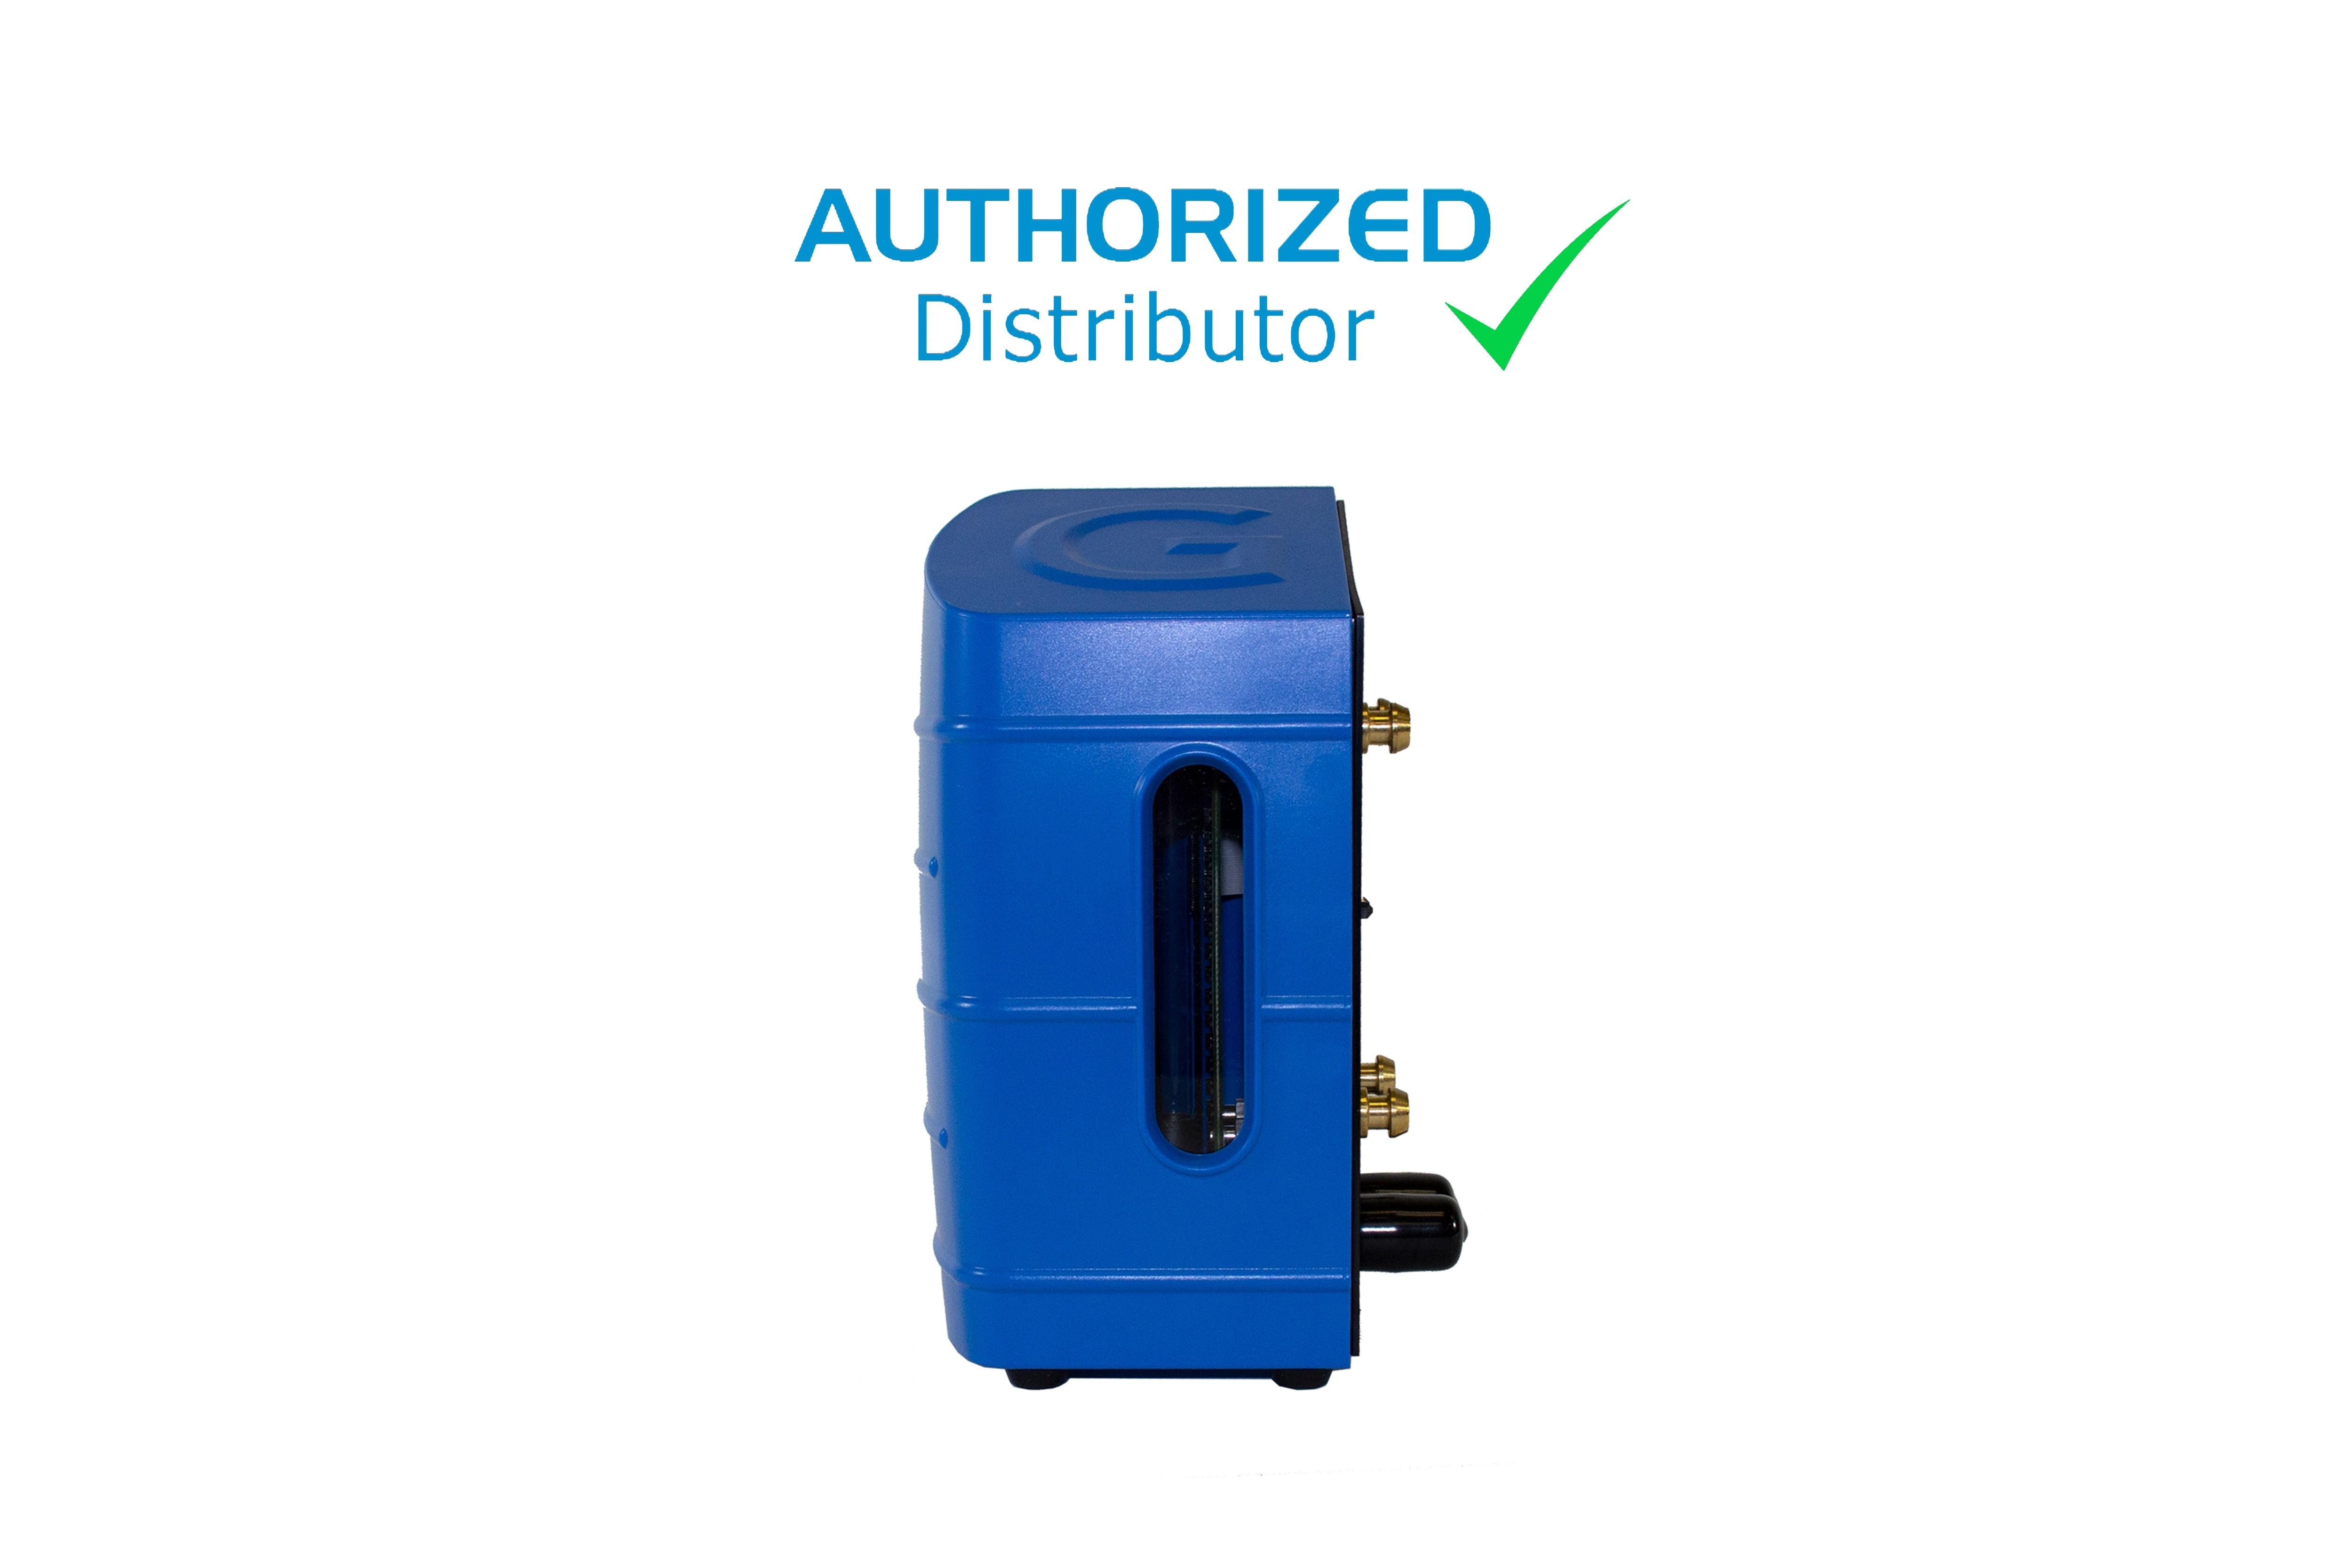 Gilibrator 3, Standard Flow Dry Cell (Flow Range 50-5,000 cc/min)